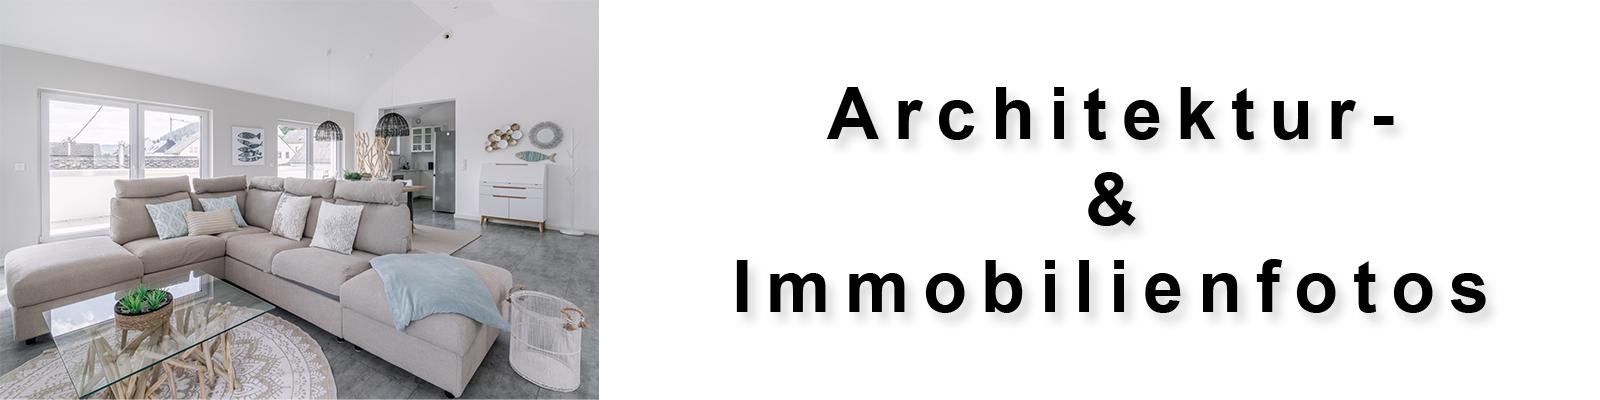 Architektur_menu